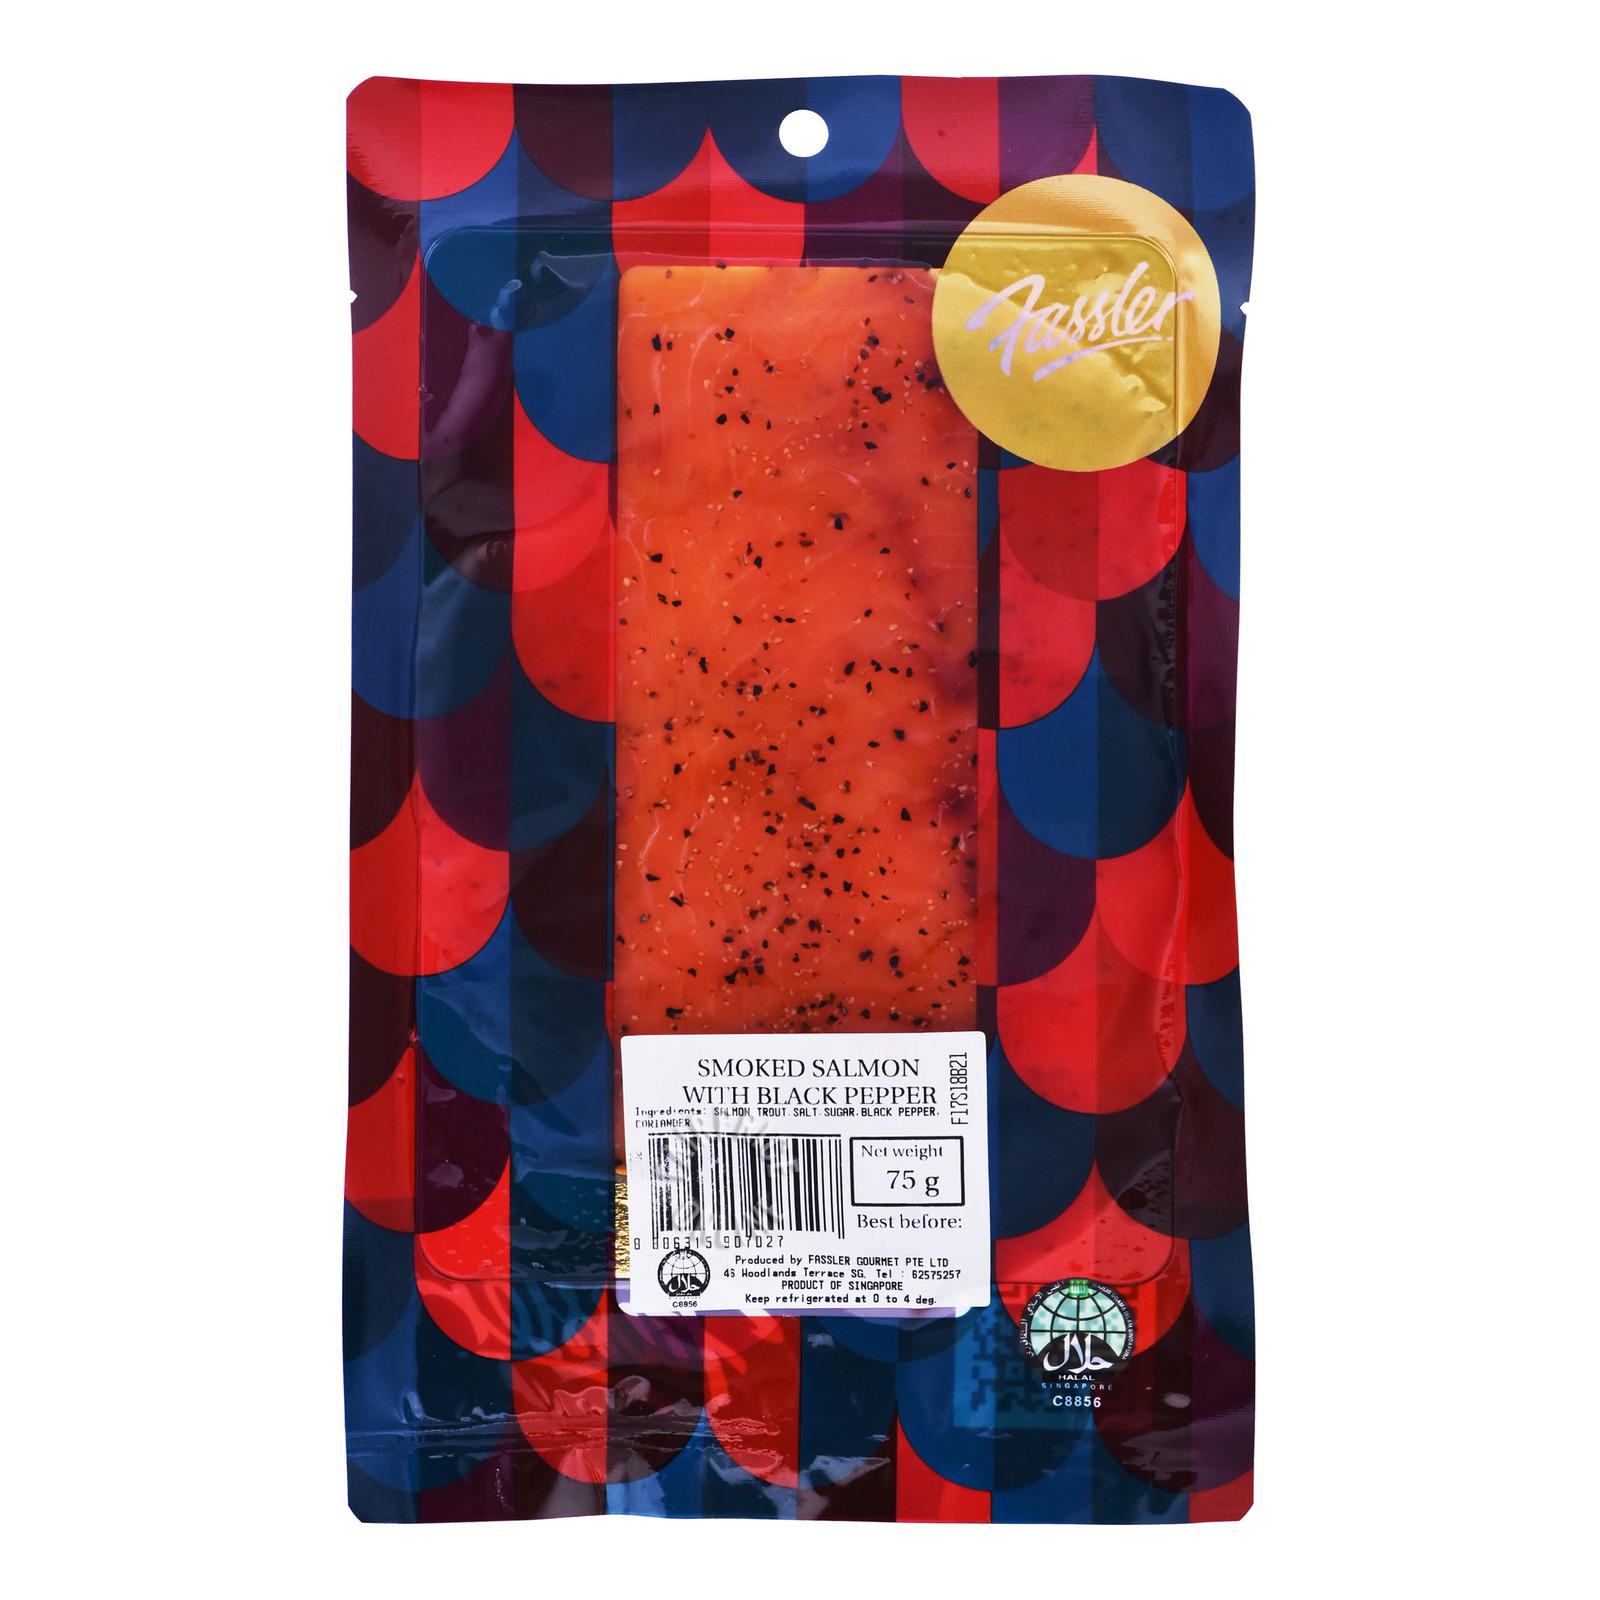 Fassler Smoked Salmon W Black Pepper - Frozen